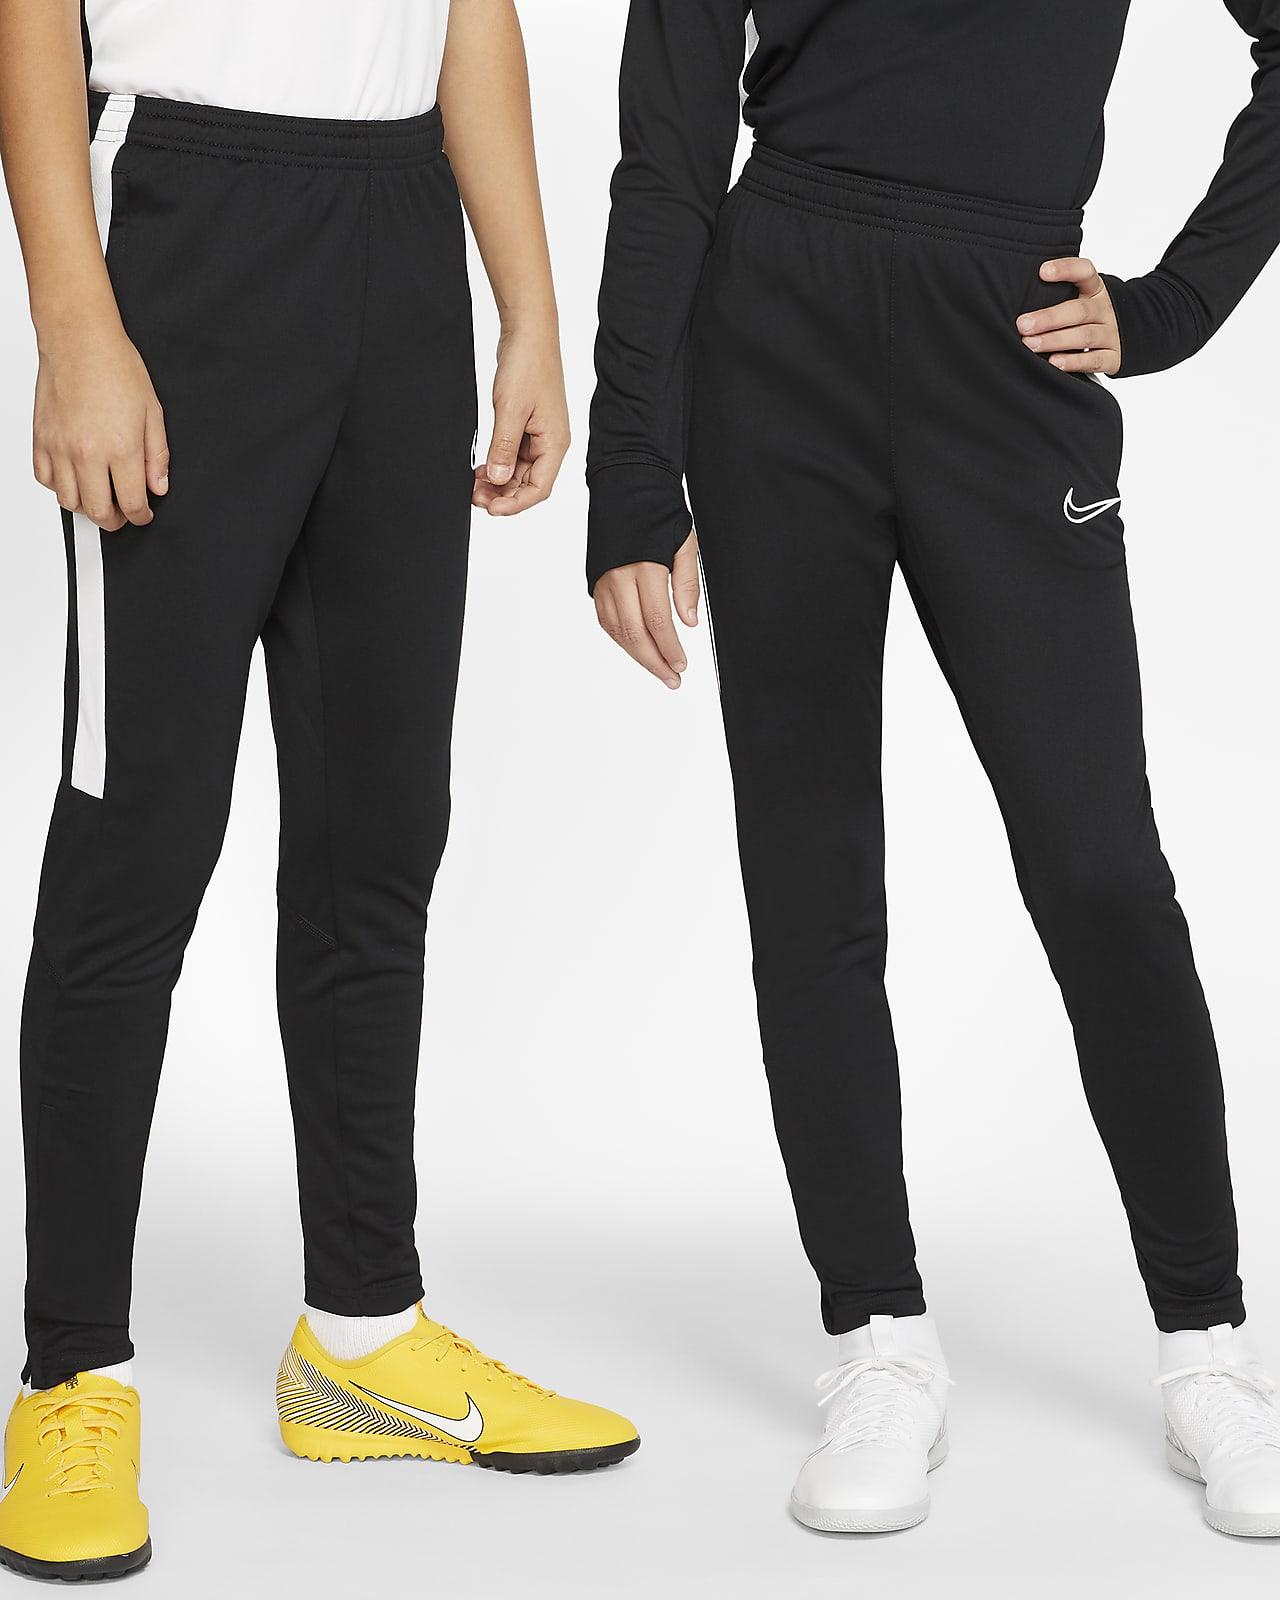 Pantaloni da calcio Nike Dri-FIT Academy - Ragazzi